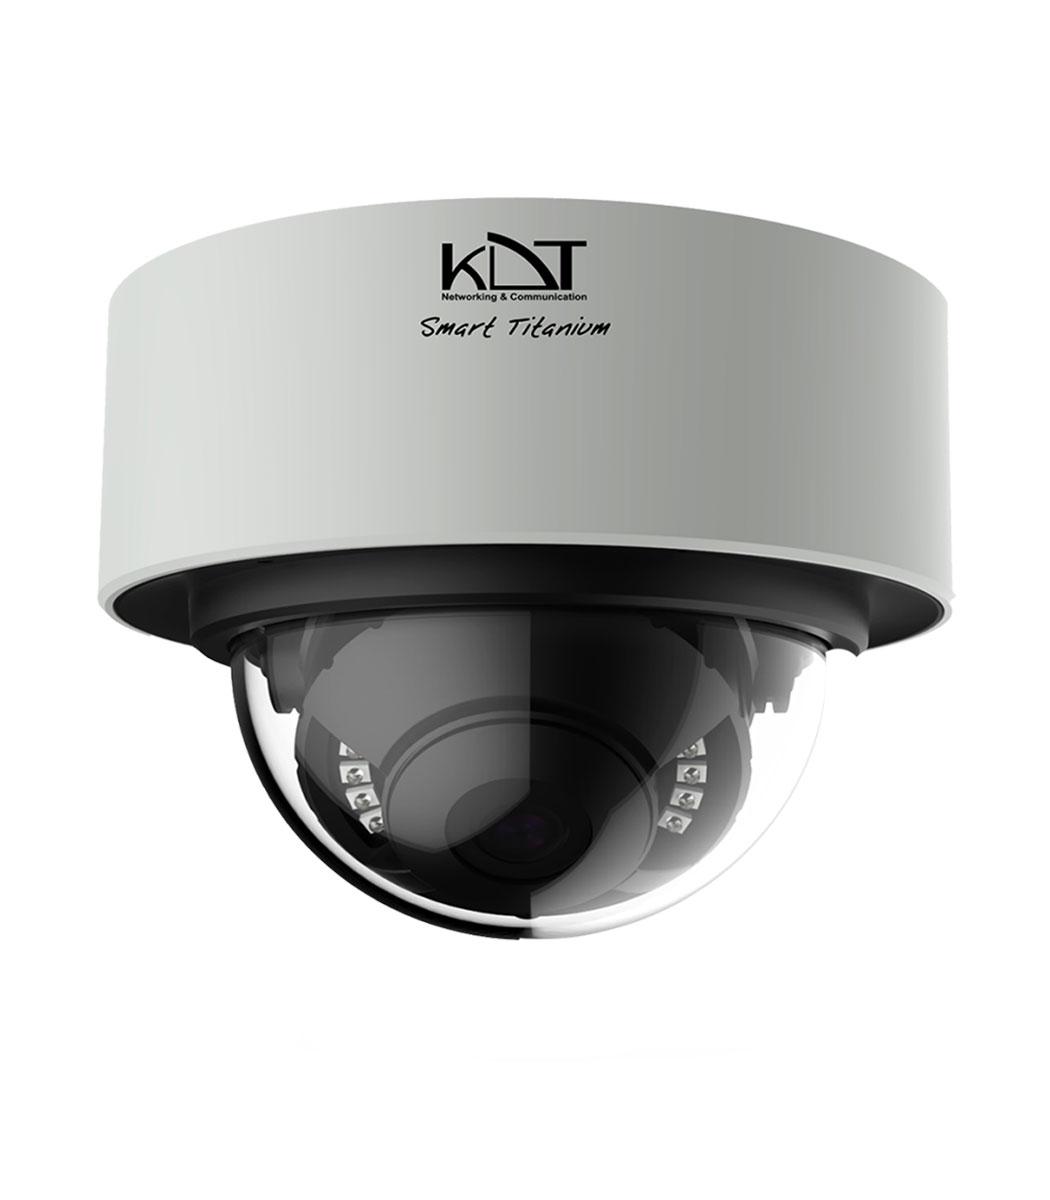 دوربین مداربسته کی دی تی مدل KI-D15ST80F